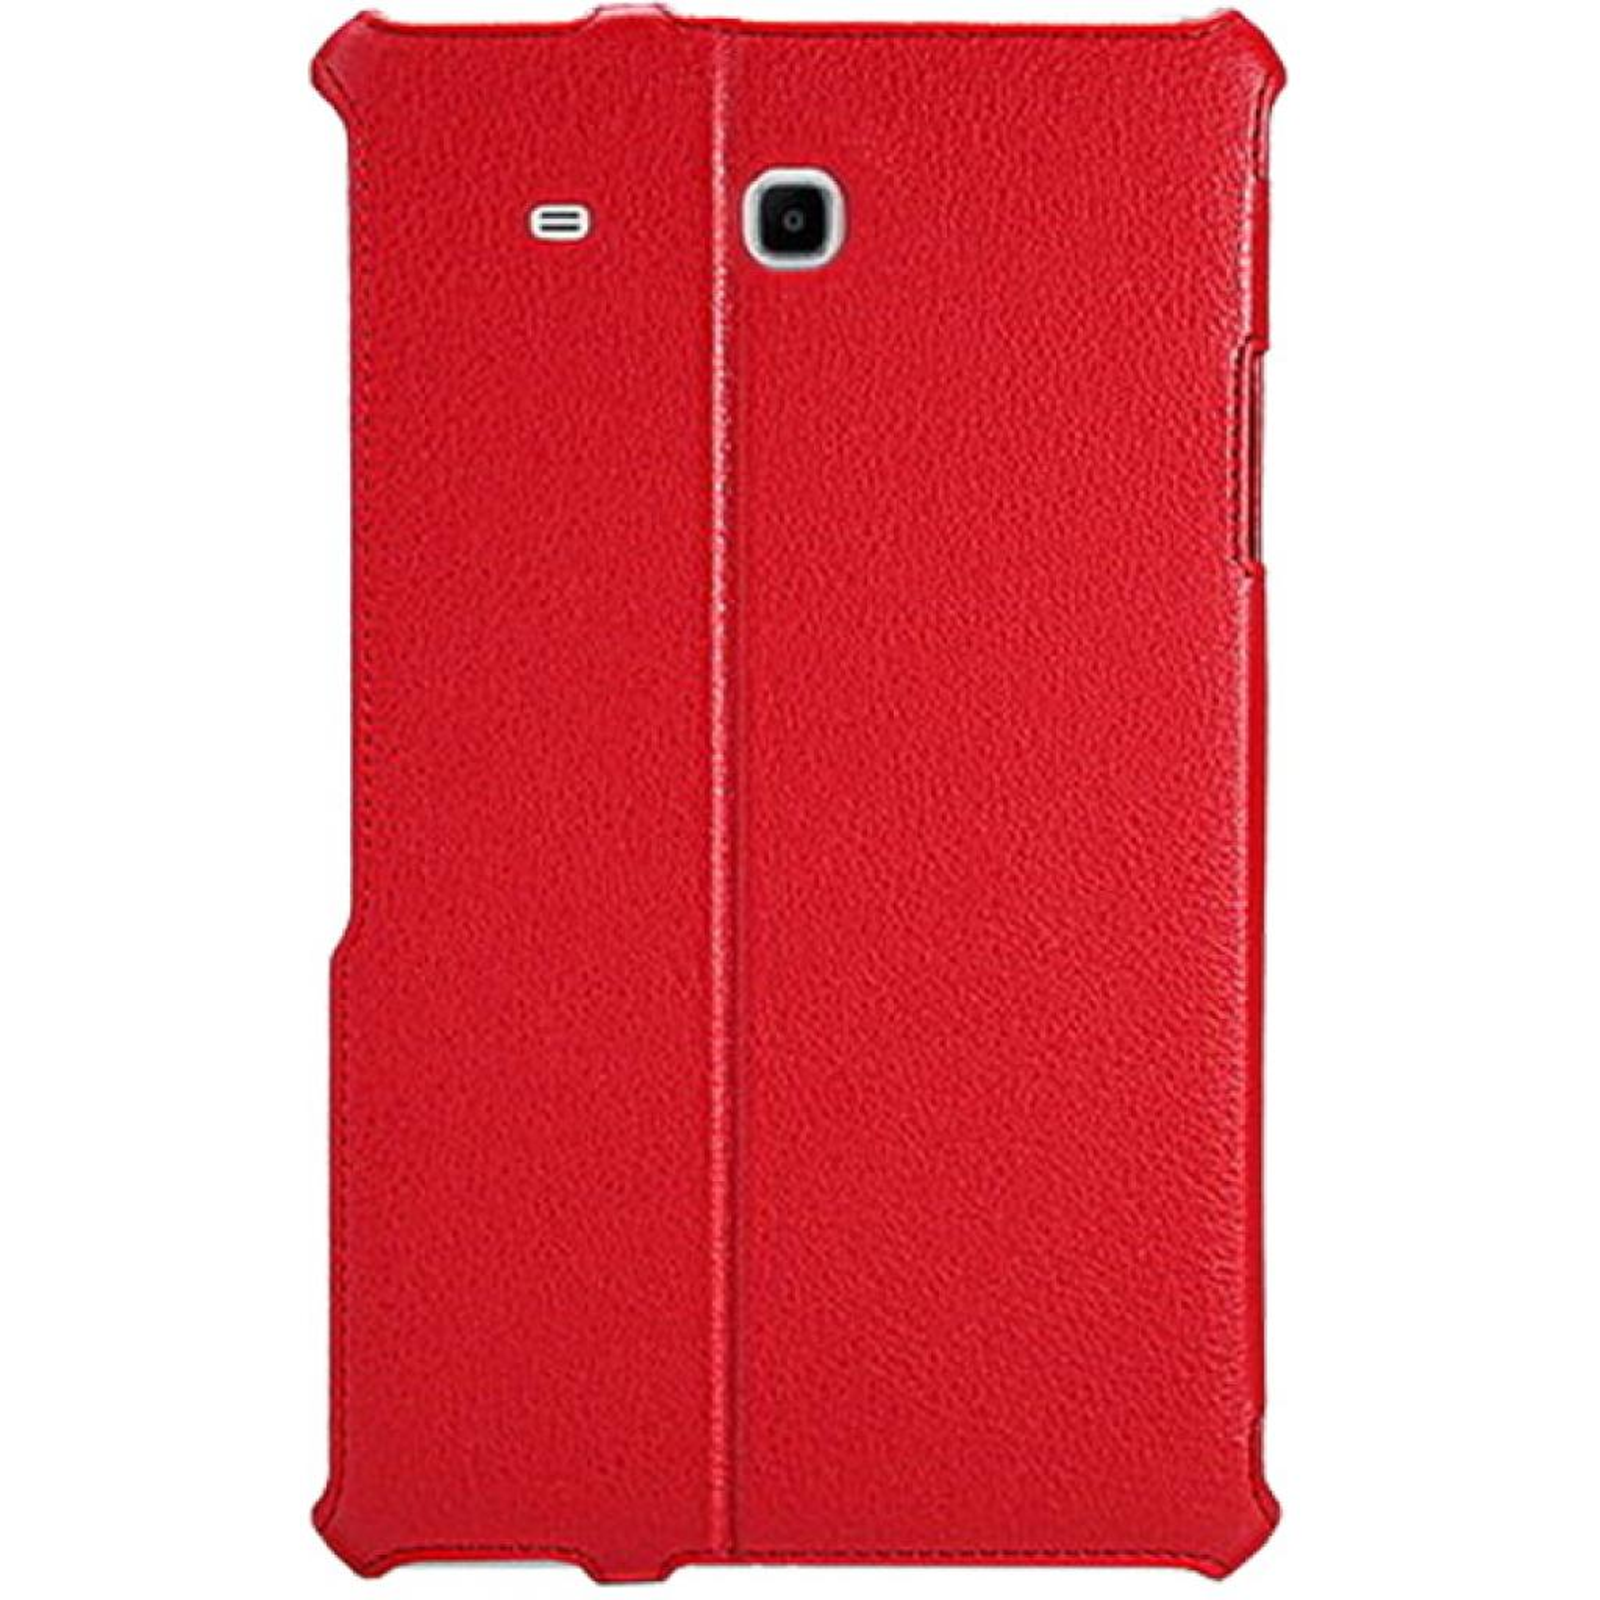 Чехол для планшета AirOn для Samsung Galaxy Tab E 9.6 red (4822352777258) изображение 2